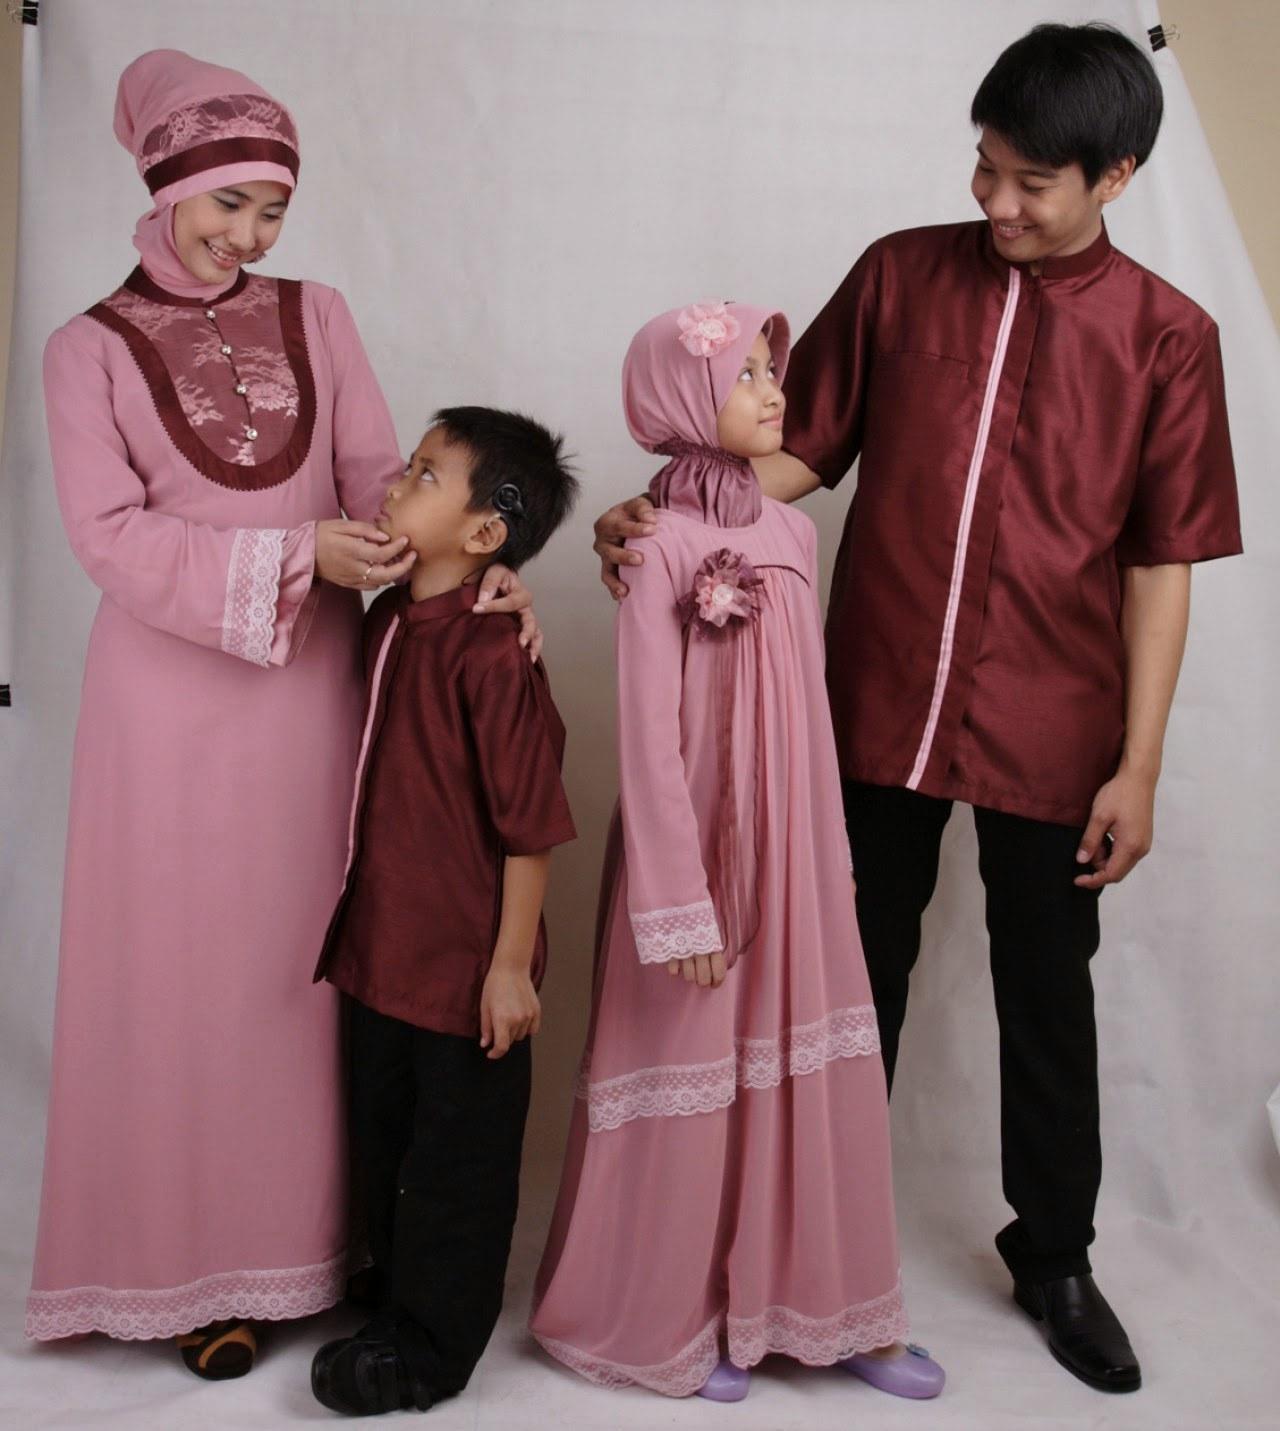 Bentuk Baju Lebaran Keluarga Terbaru Xtd6 Model Baju Keluarga Muslim Seragam Kembar Terbaru 2018